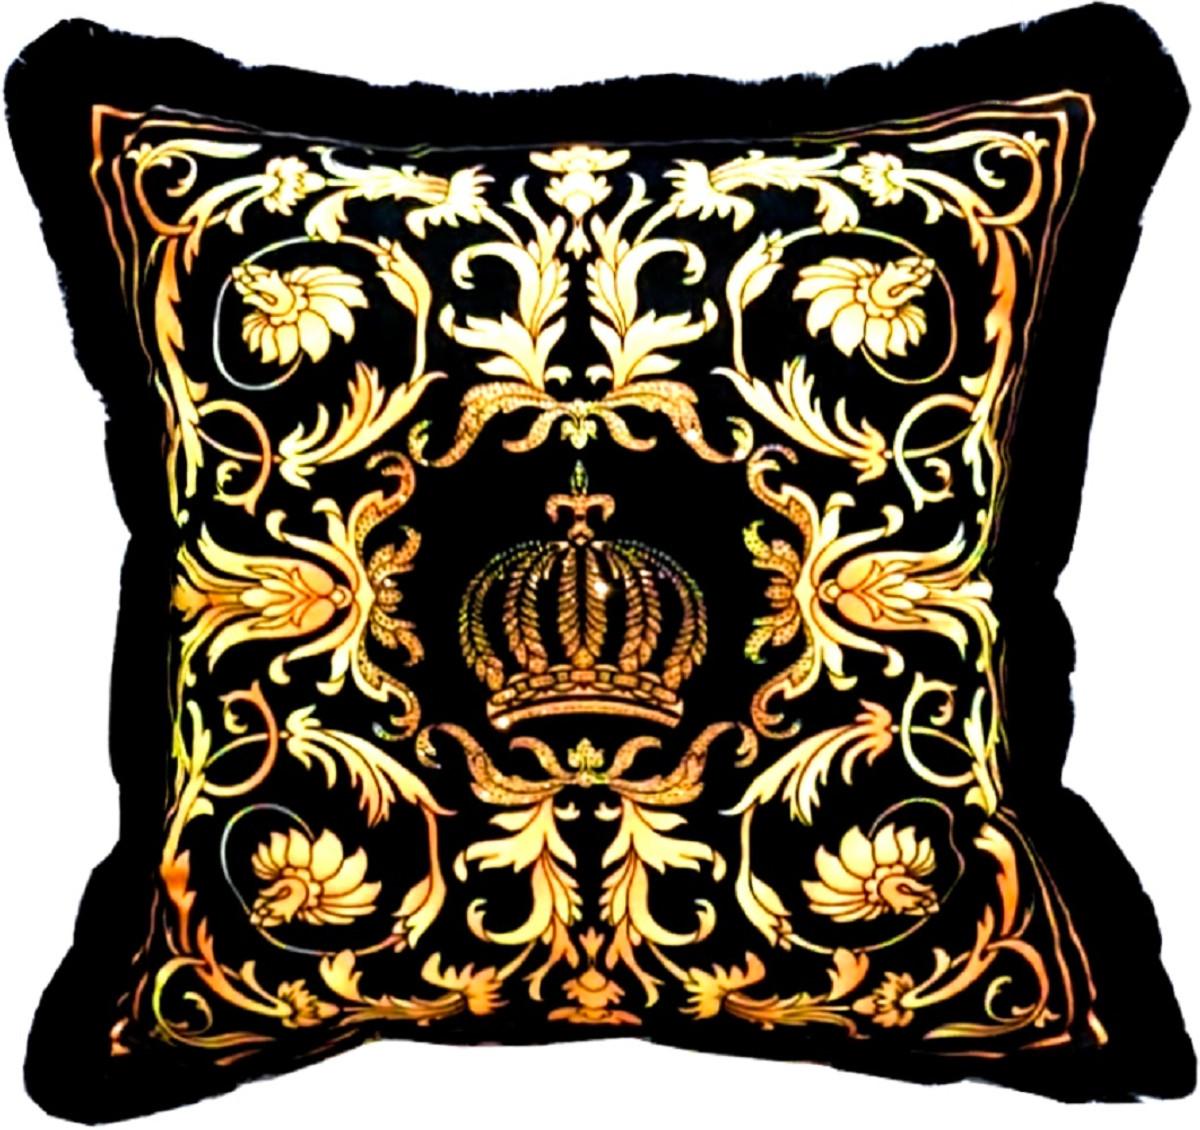 harald gloockler luxury decorative pillow pompoos by casa padrino black gold baroque pattern black 50 x 50 cm gloockler pillow with rhinestones